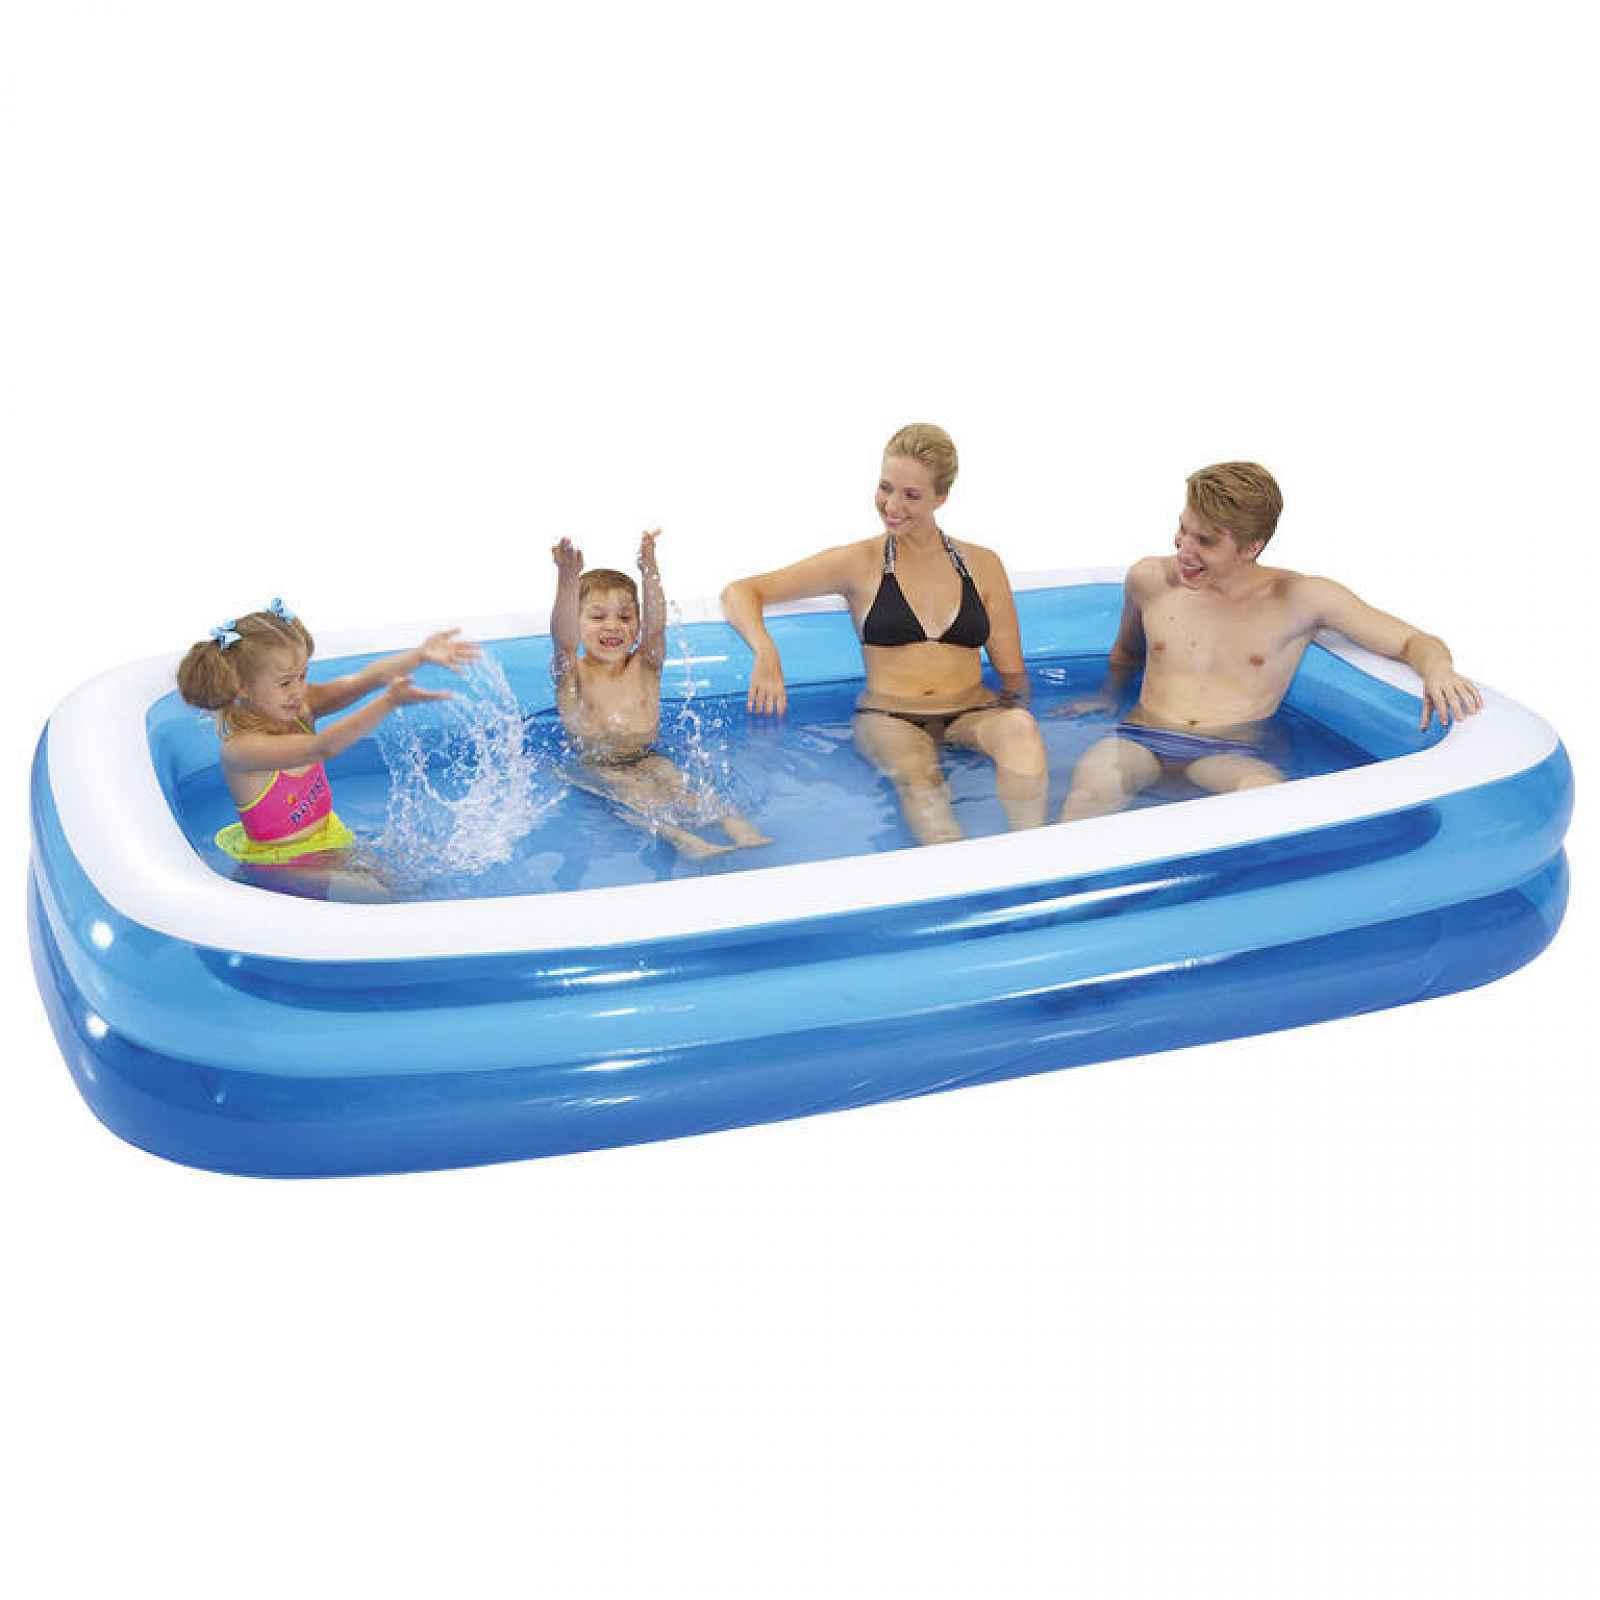 Bestway 54006 Family Pool 262 x 175 x 51 cm